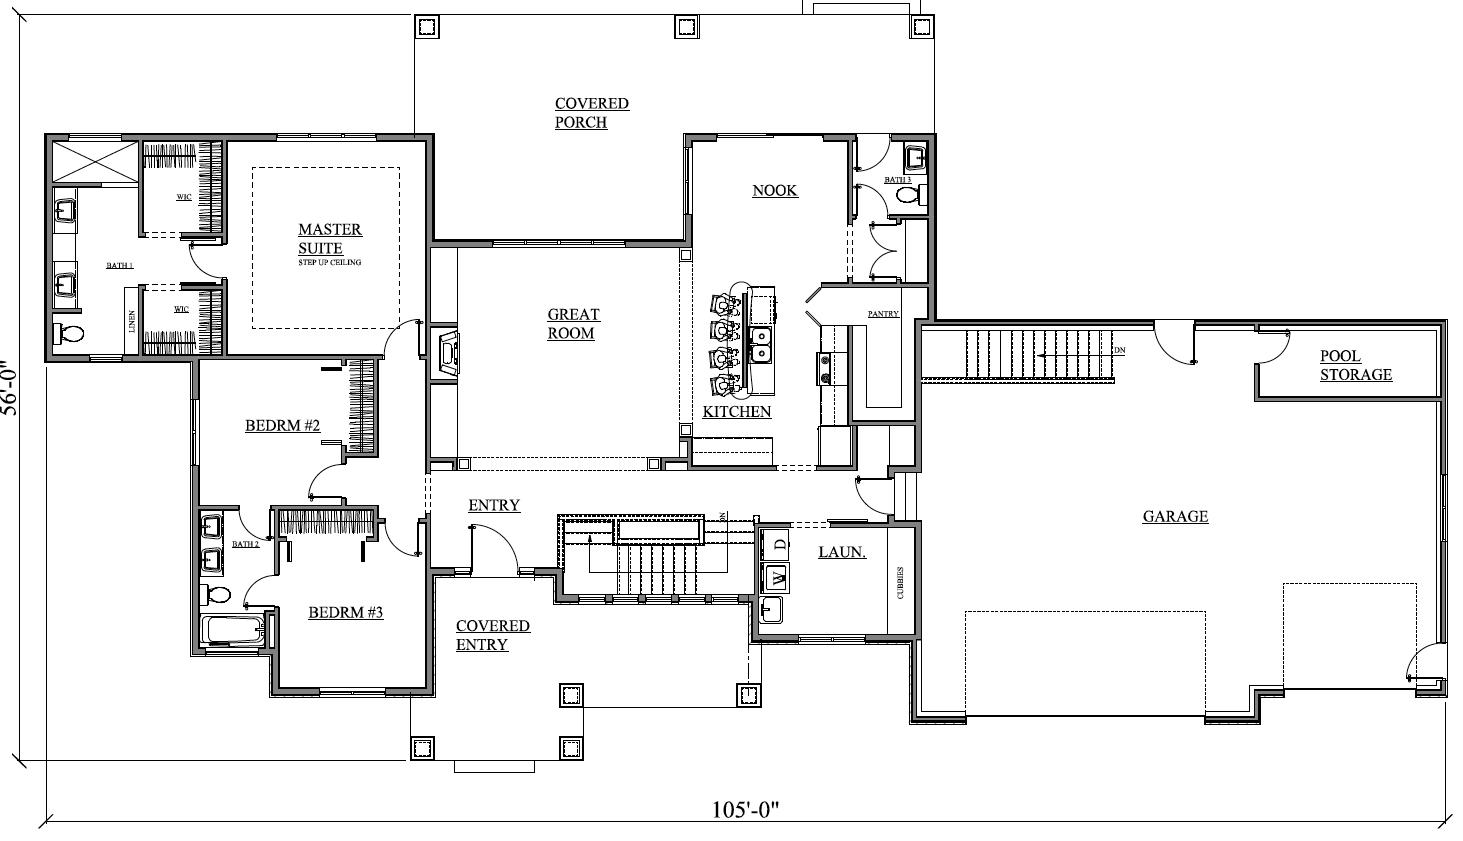 Custom design home with jack and jill bathroom by prull - What is a jack and jill bathroom ...